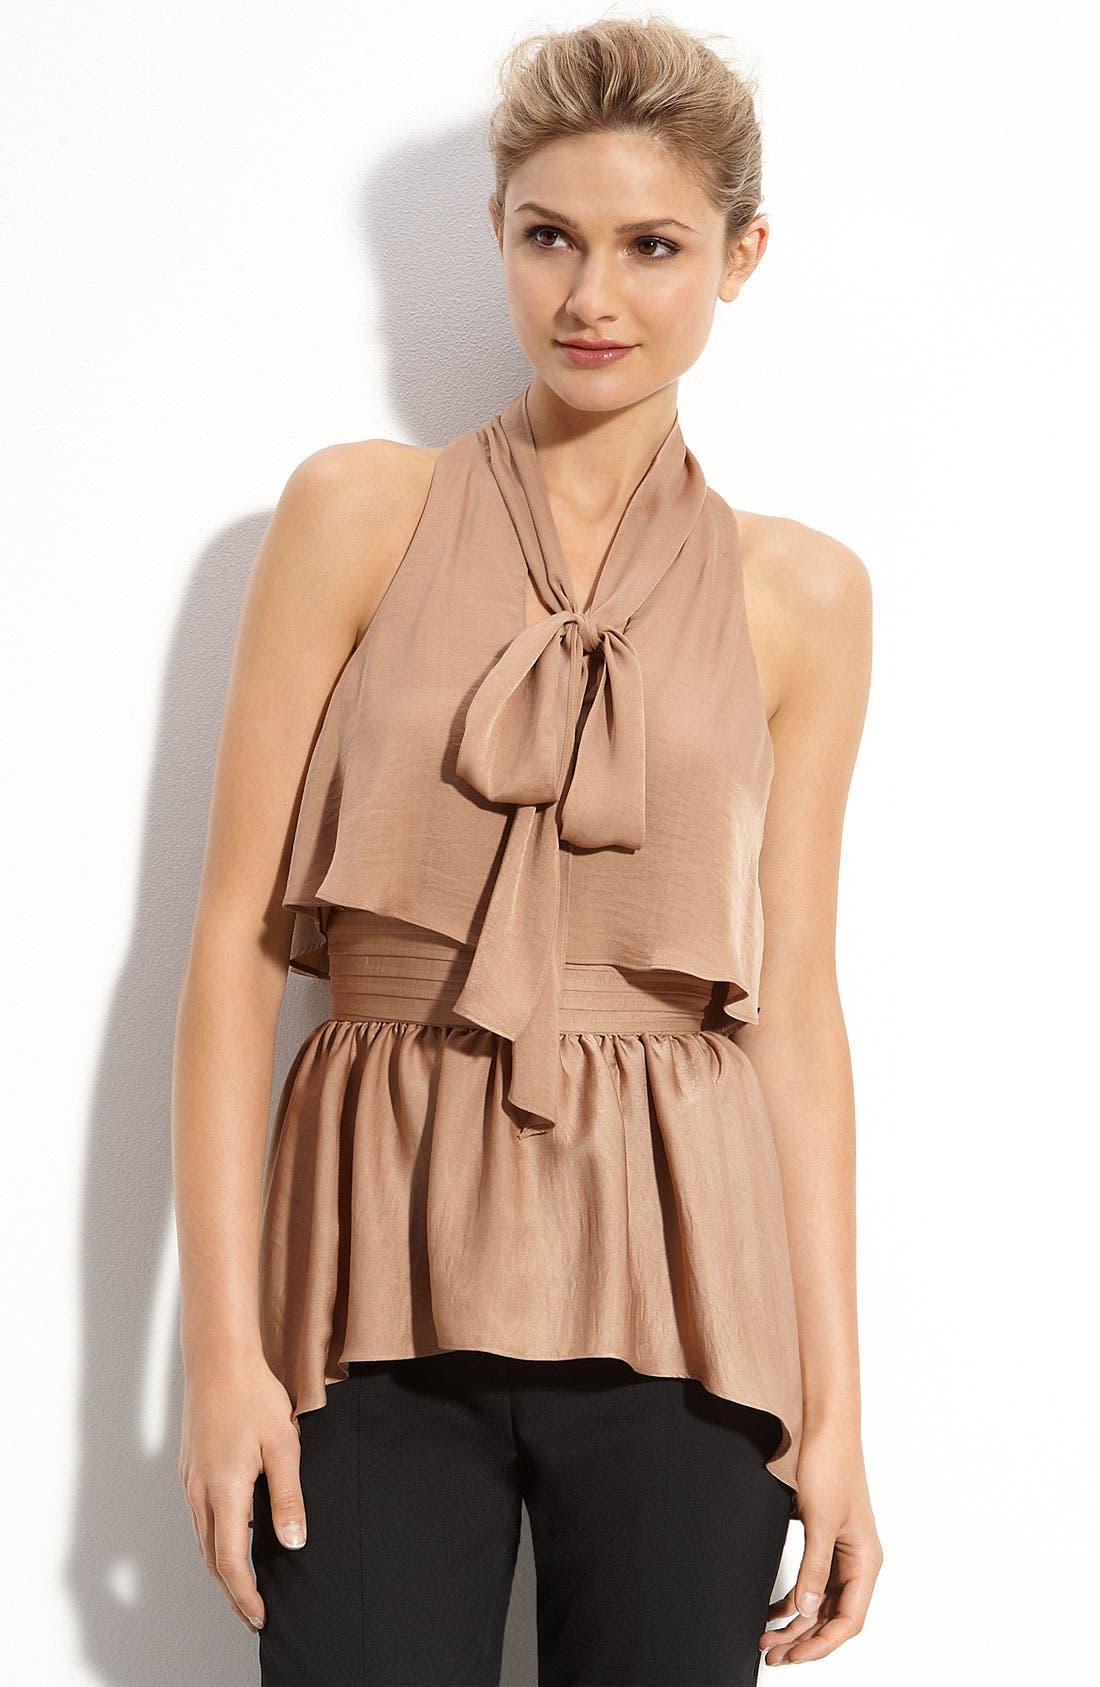 Main Image - BCBGMAXAZRIA 'Celline' Tie Neck Top